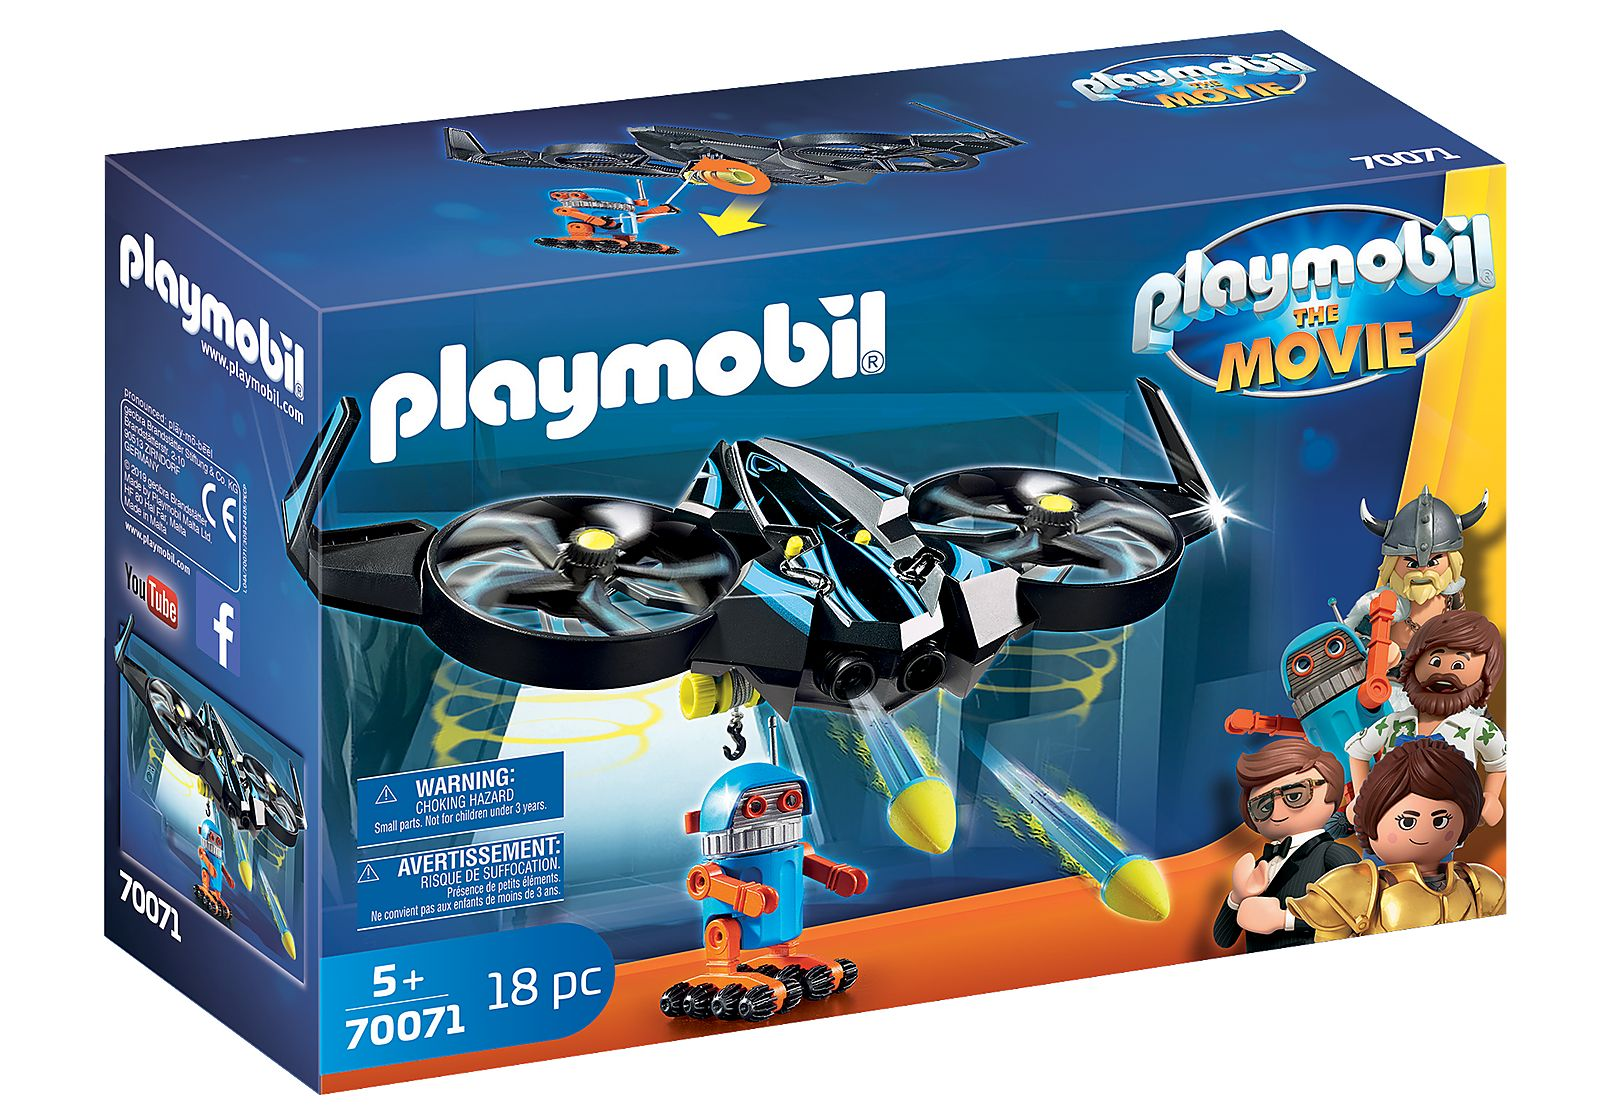 PLAYMOBIL 70071  THE MOVIE ROBOTITRON CON DRON